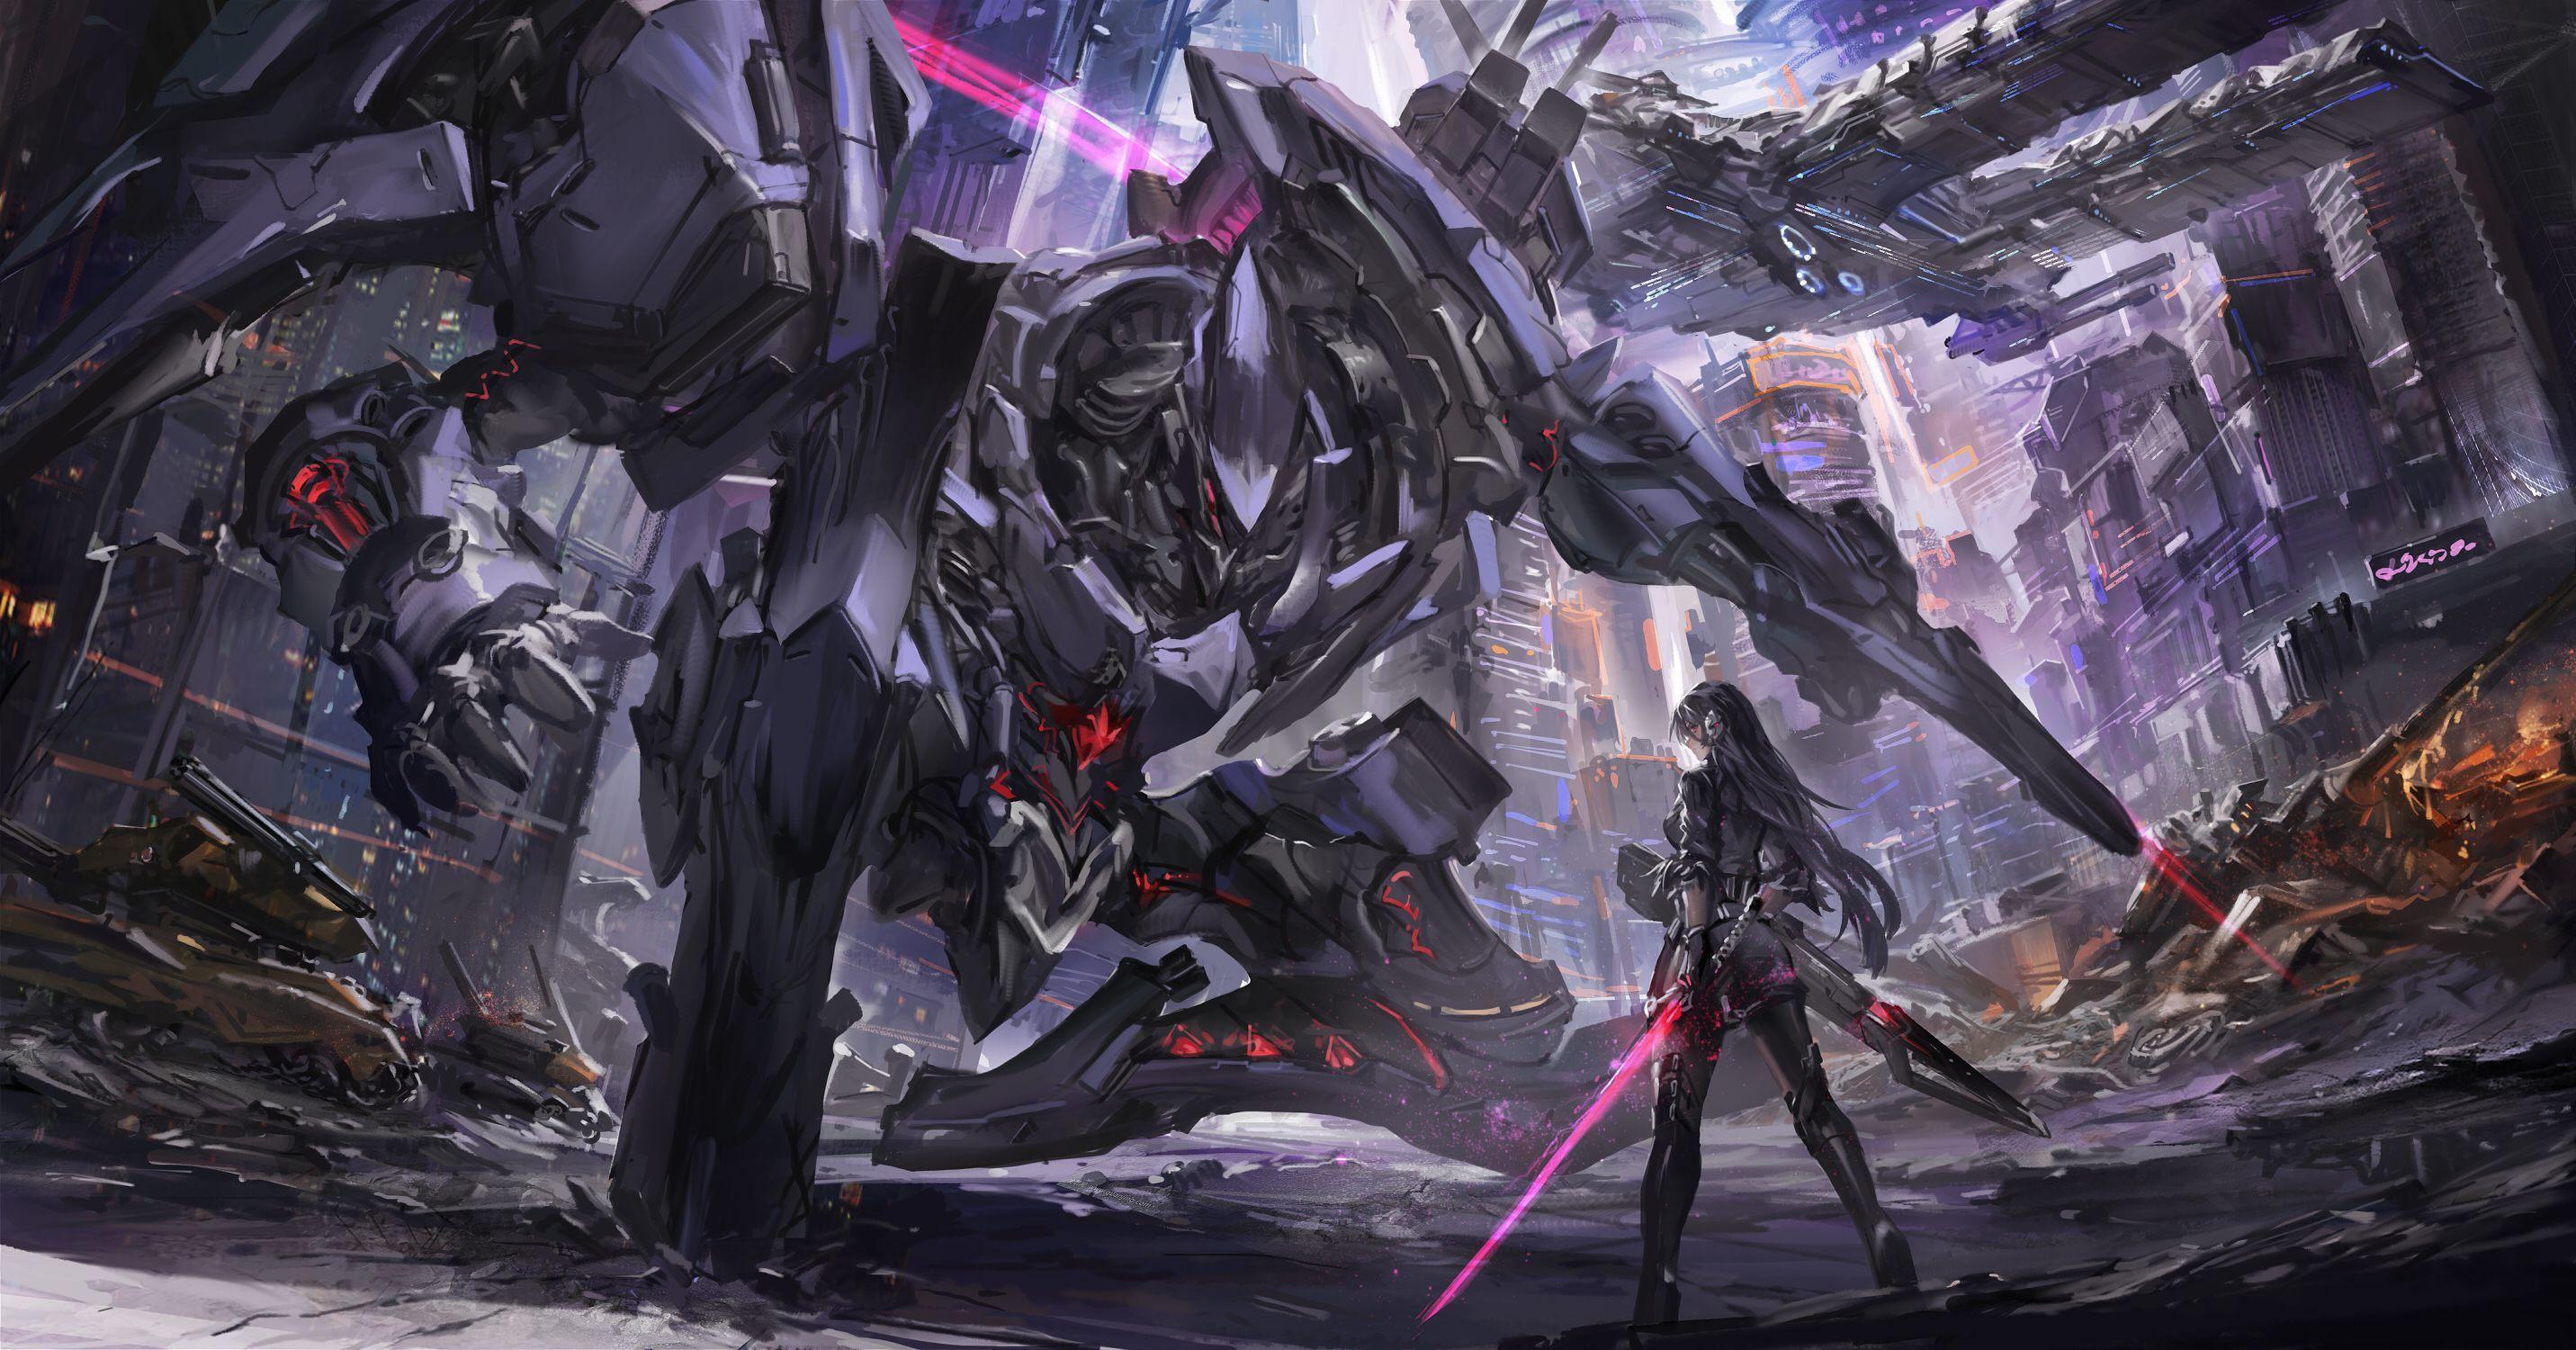 Anime Sci Fi Wallpapers Top Free Anime Sci Fi Backgrounds Wallpaperaccess Robot Wallpaper Mecha Sci Fi Wallpaper